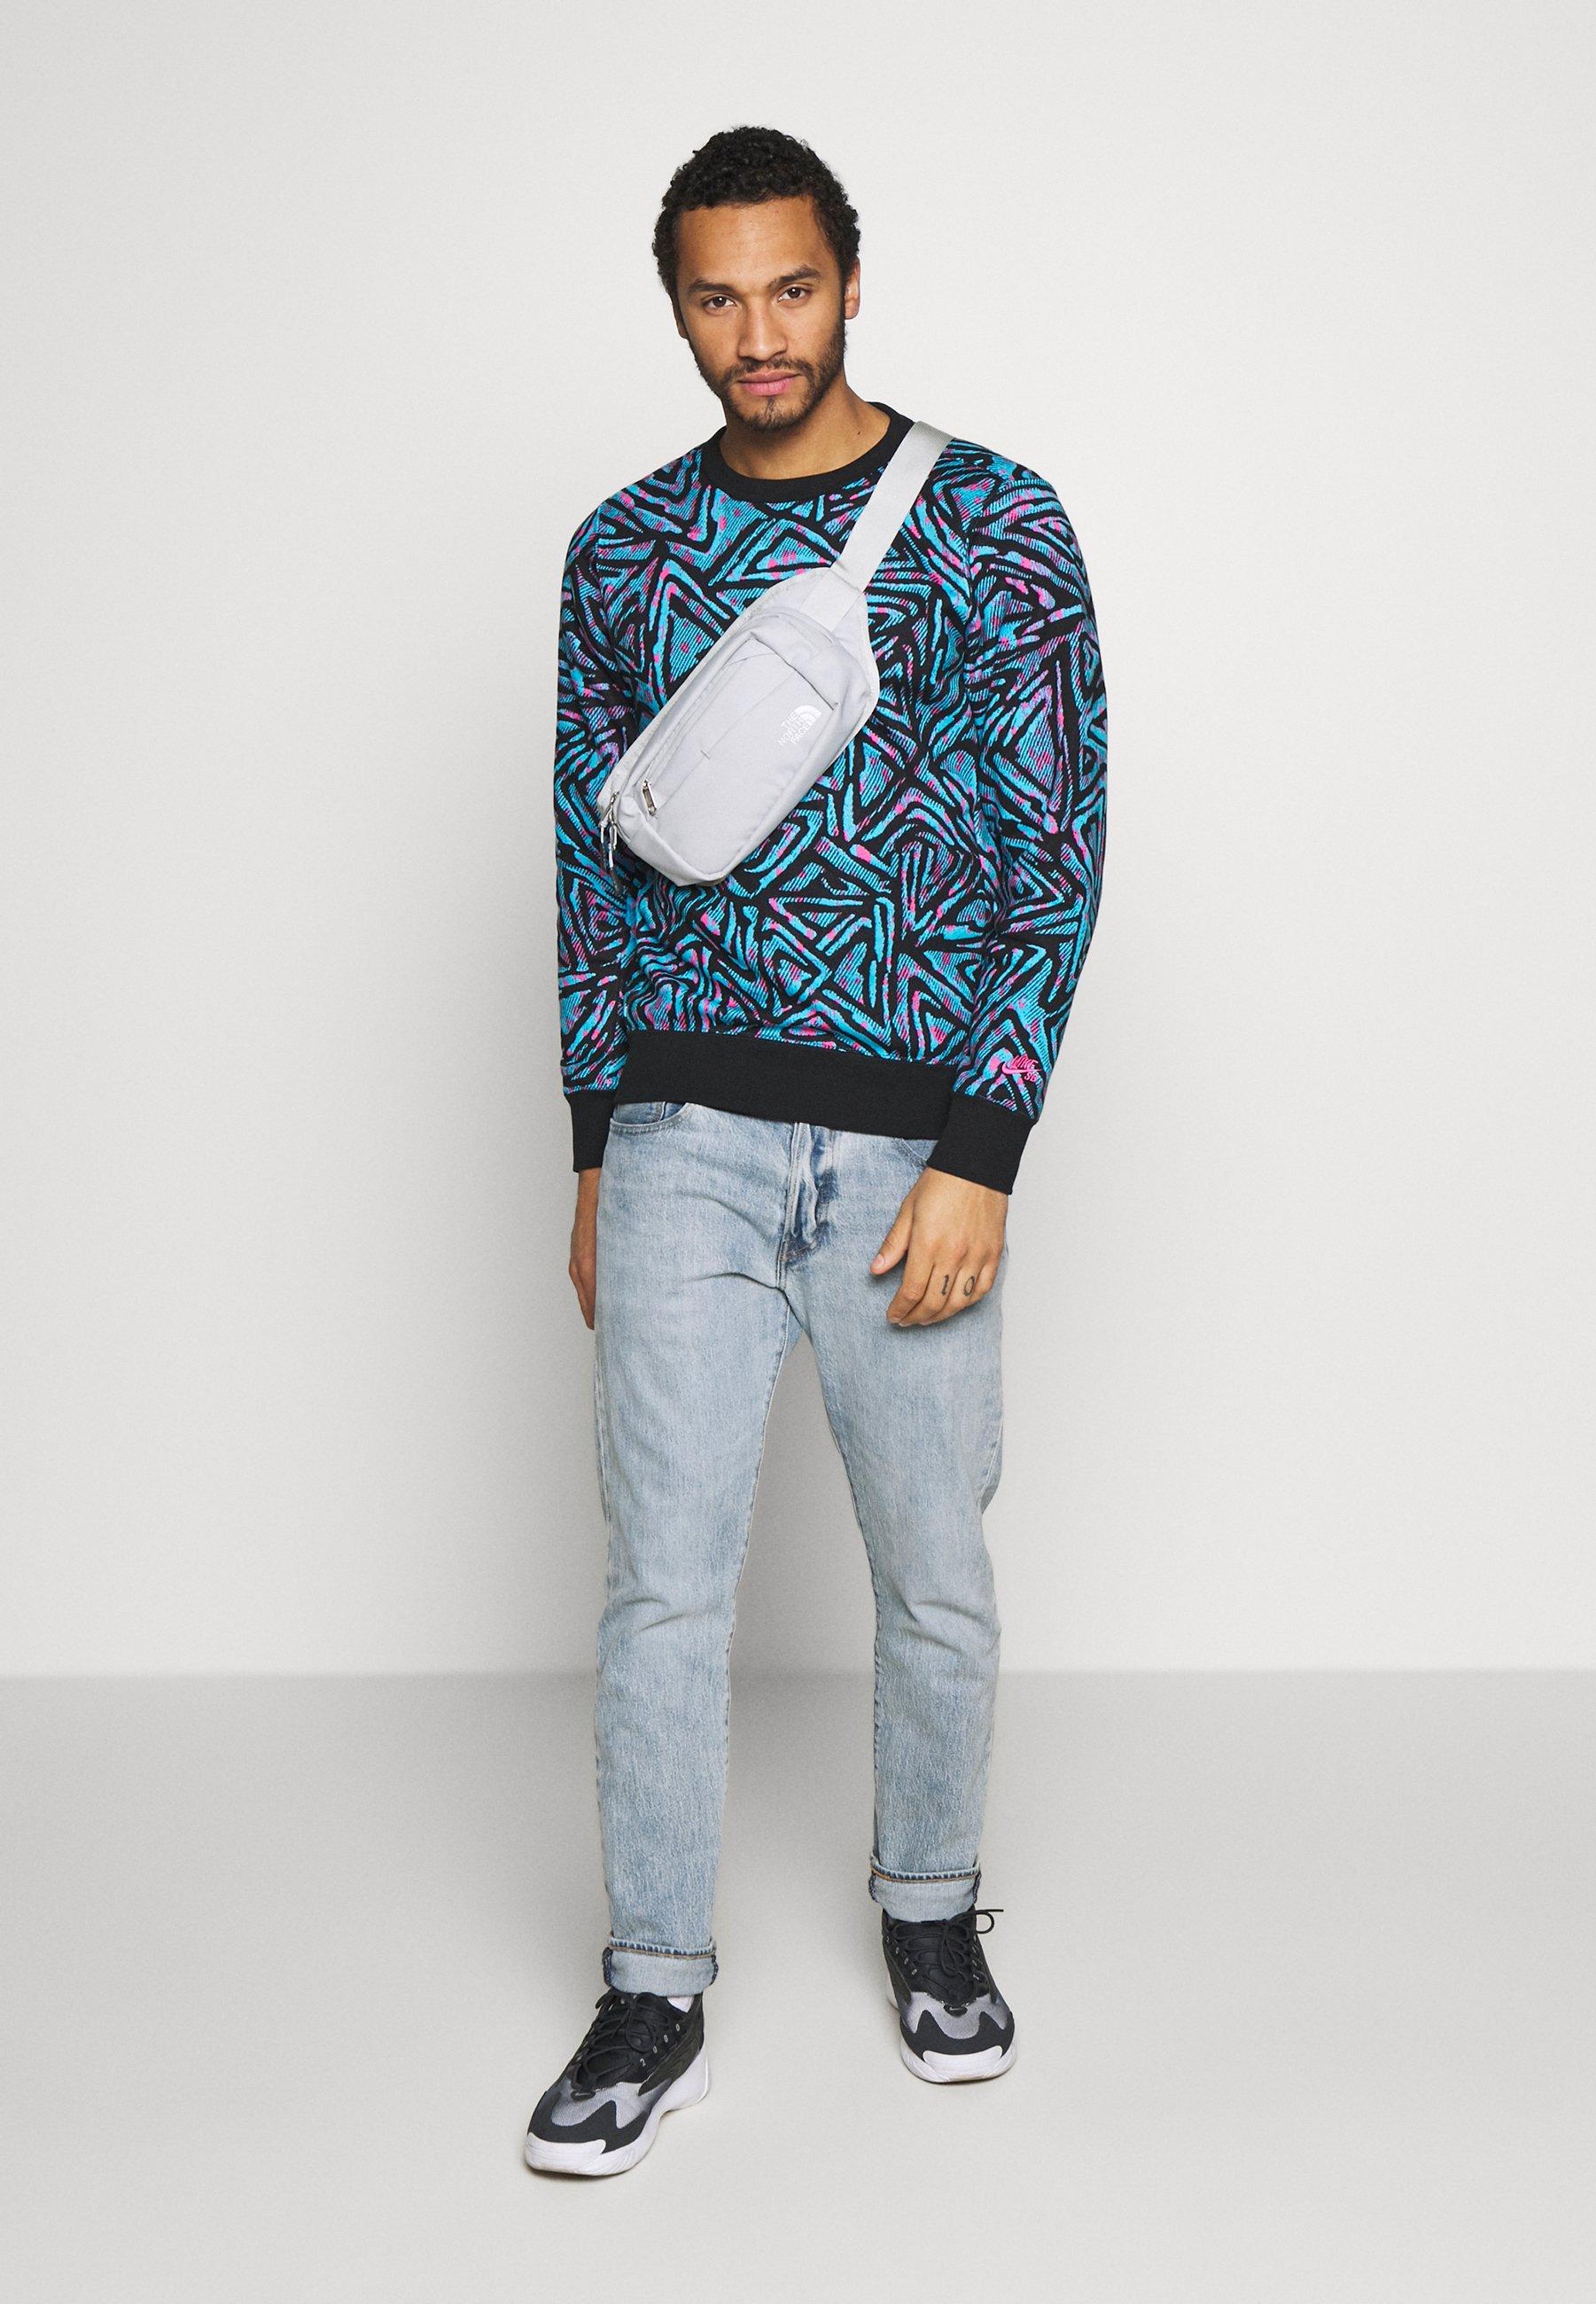 Nike Sb Sweatshirt - Laser Blue/black/watermelon